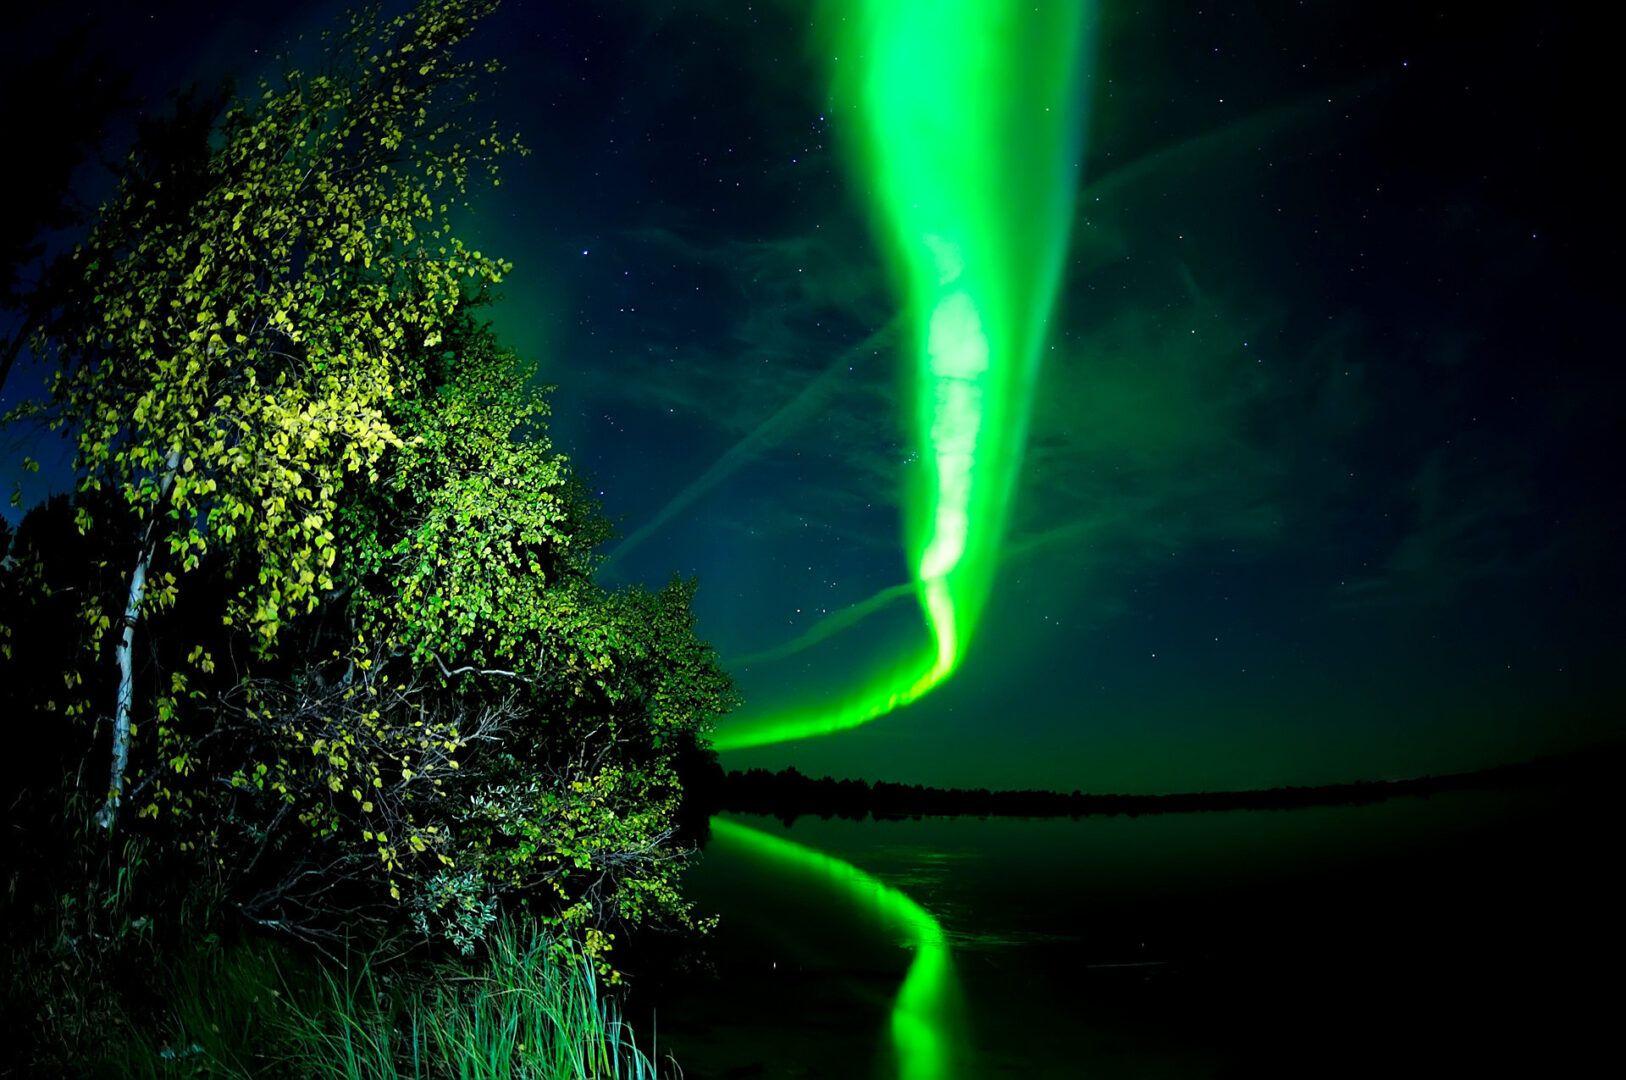 Onde ver a Aurora Boreal - 9 países para ver esse fenômeno da natureza